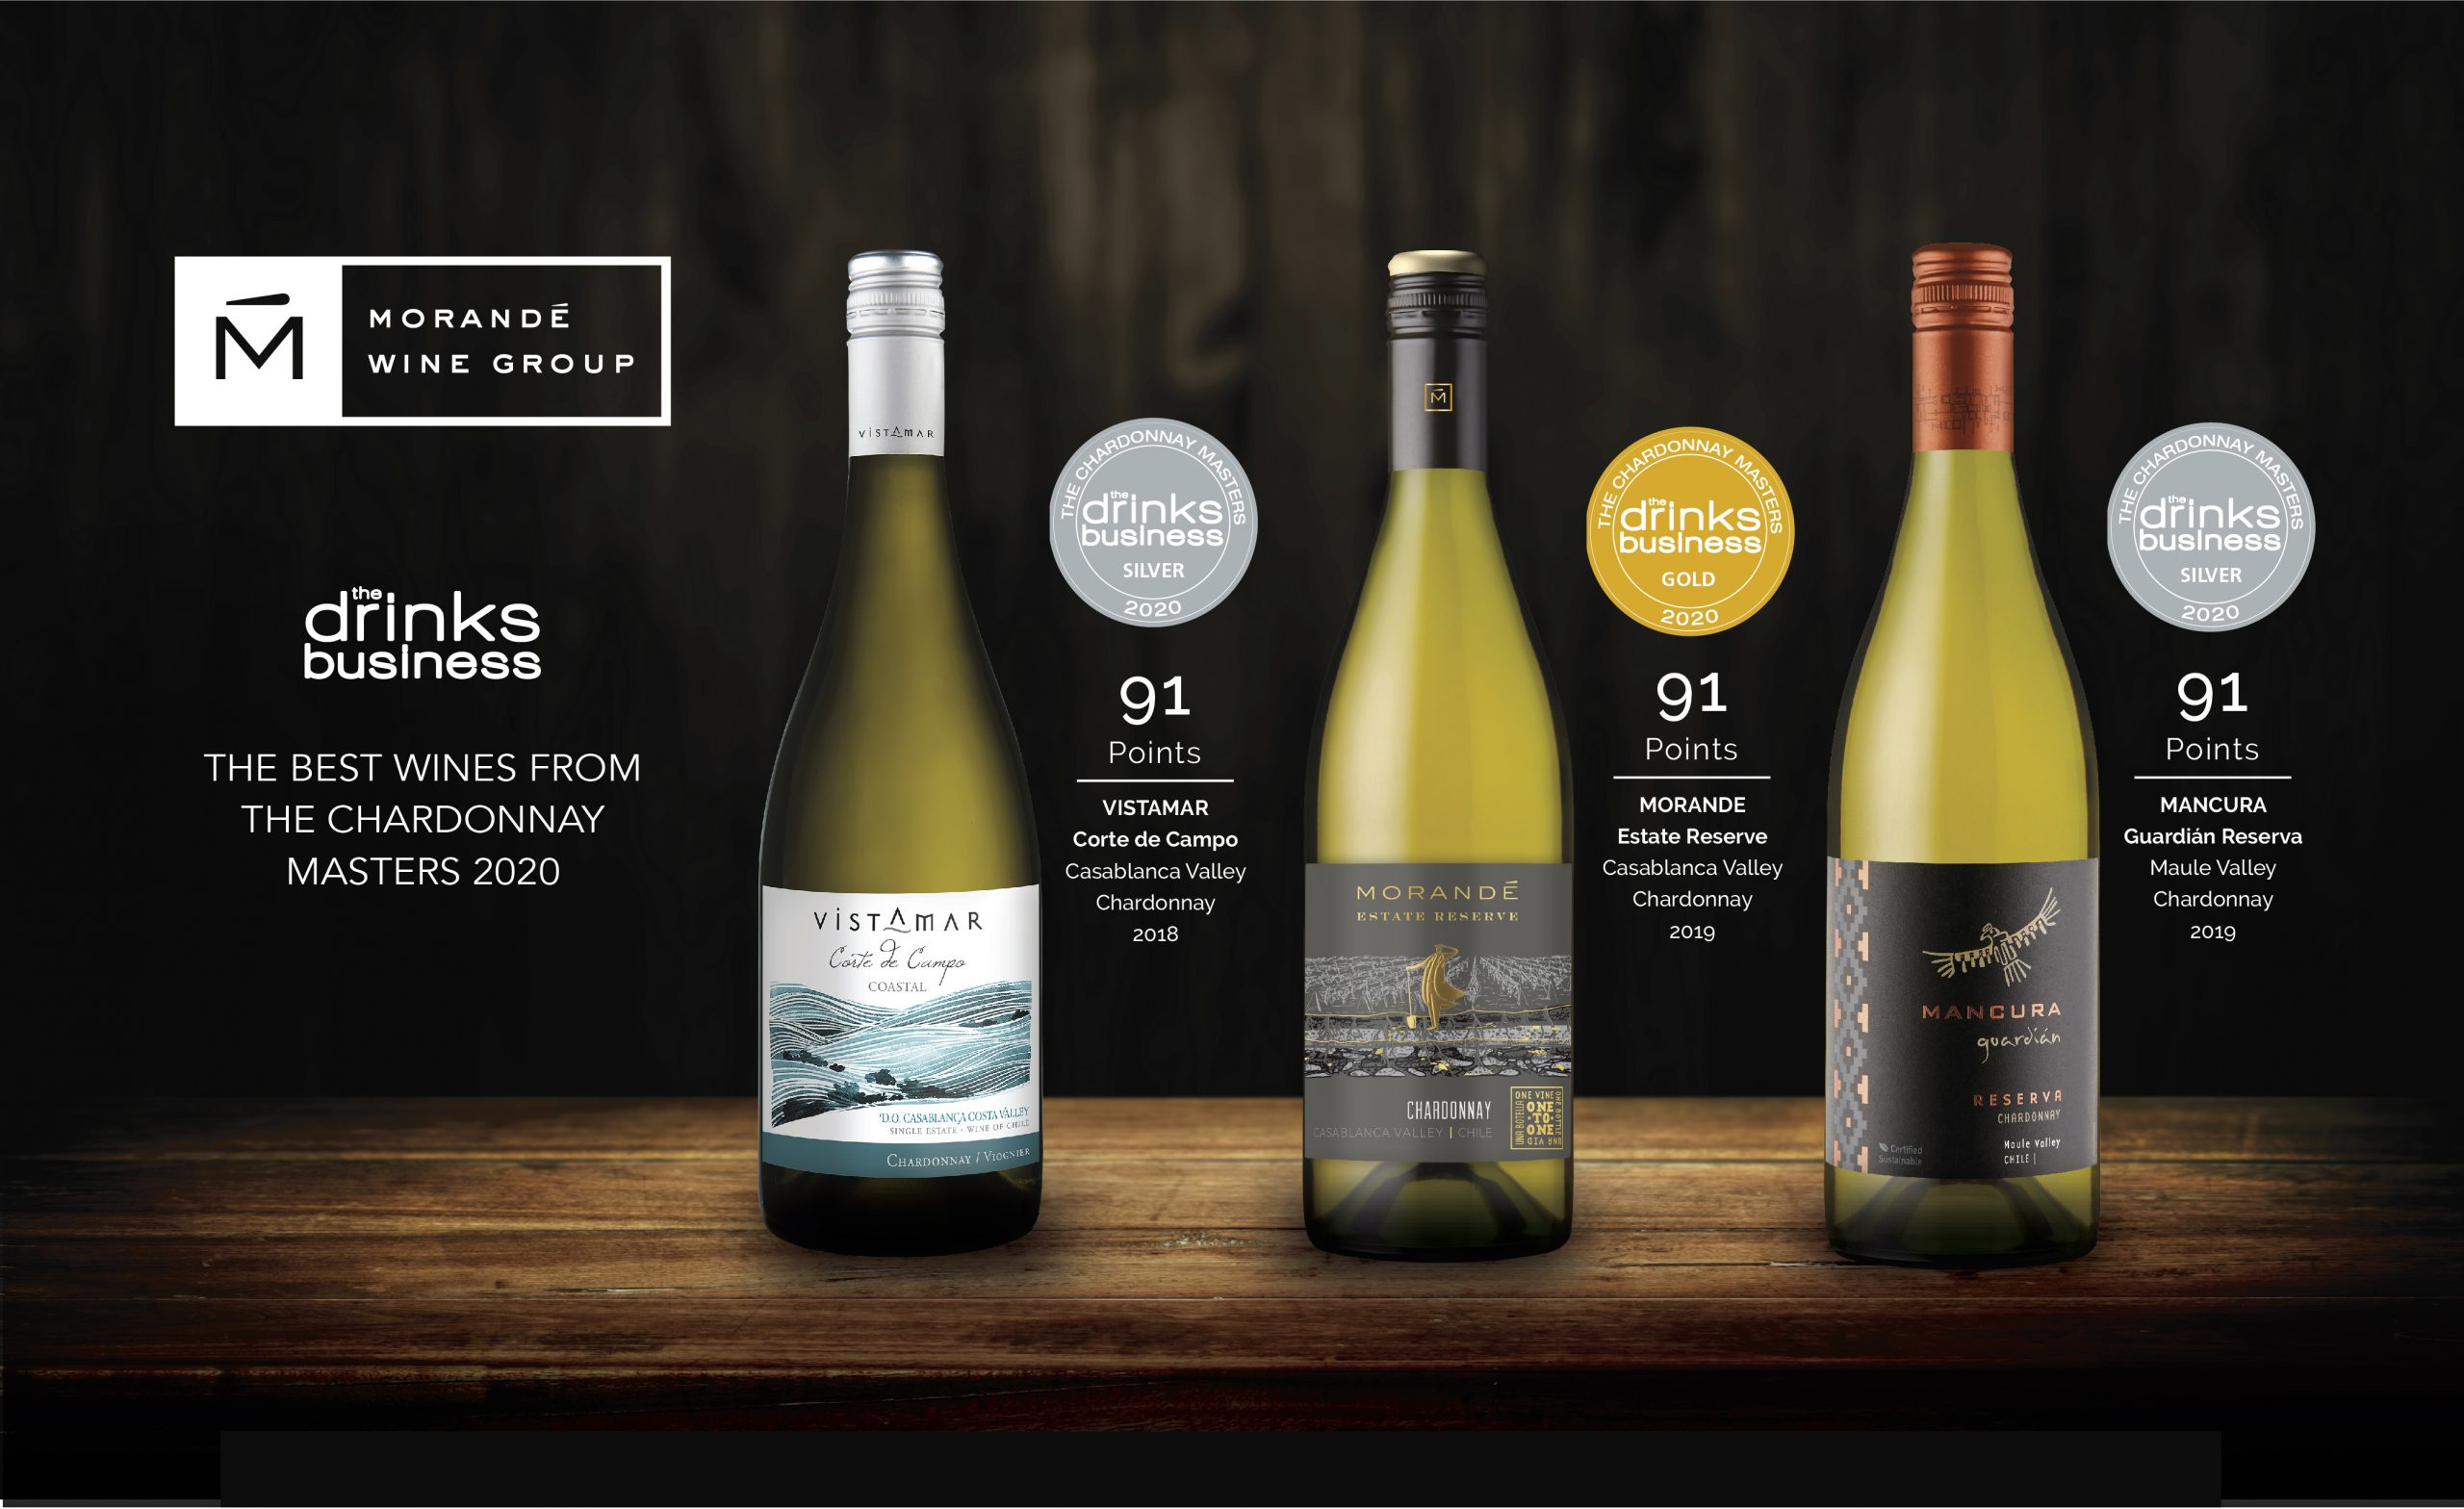 MORANDE WINE GROUP OBTIENE EXCELENTES PUNTAJES EN THE BEST WINES FROM THE CHARDONNAY MASTERS 2020